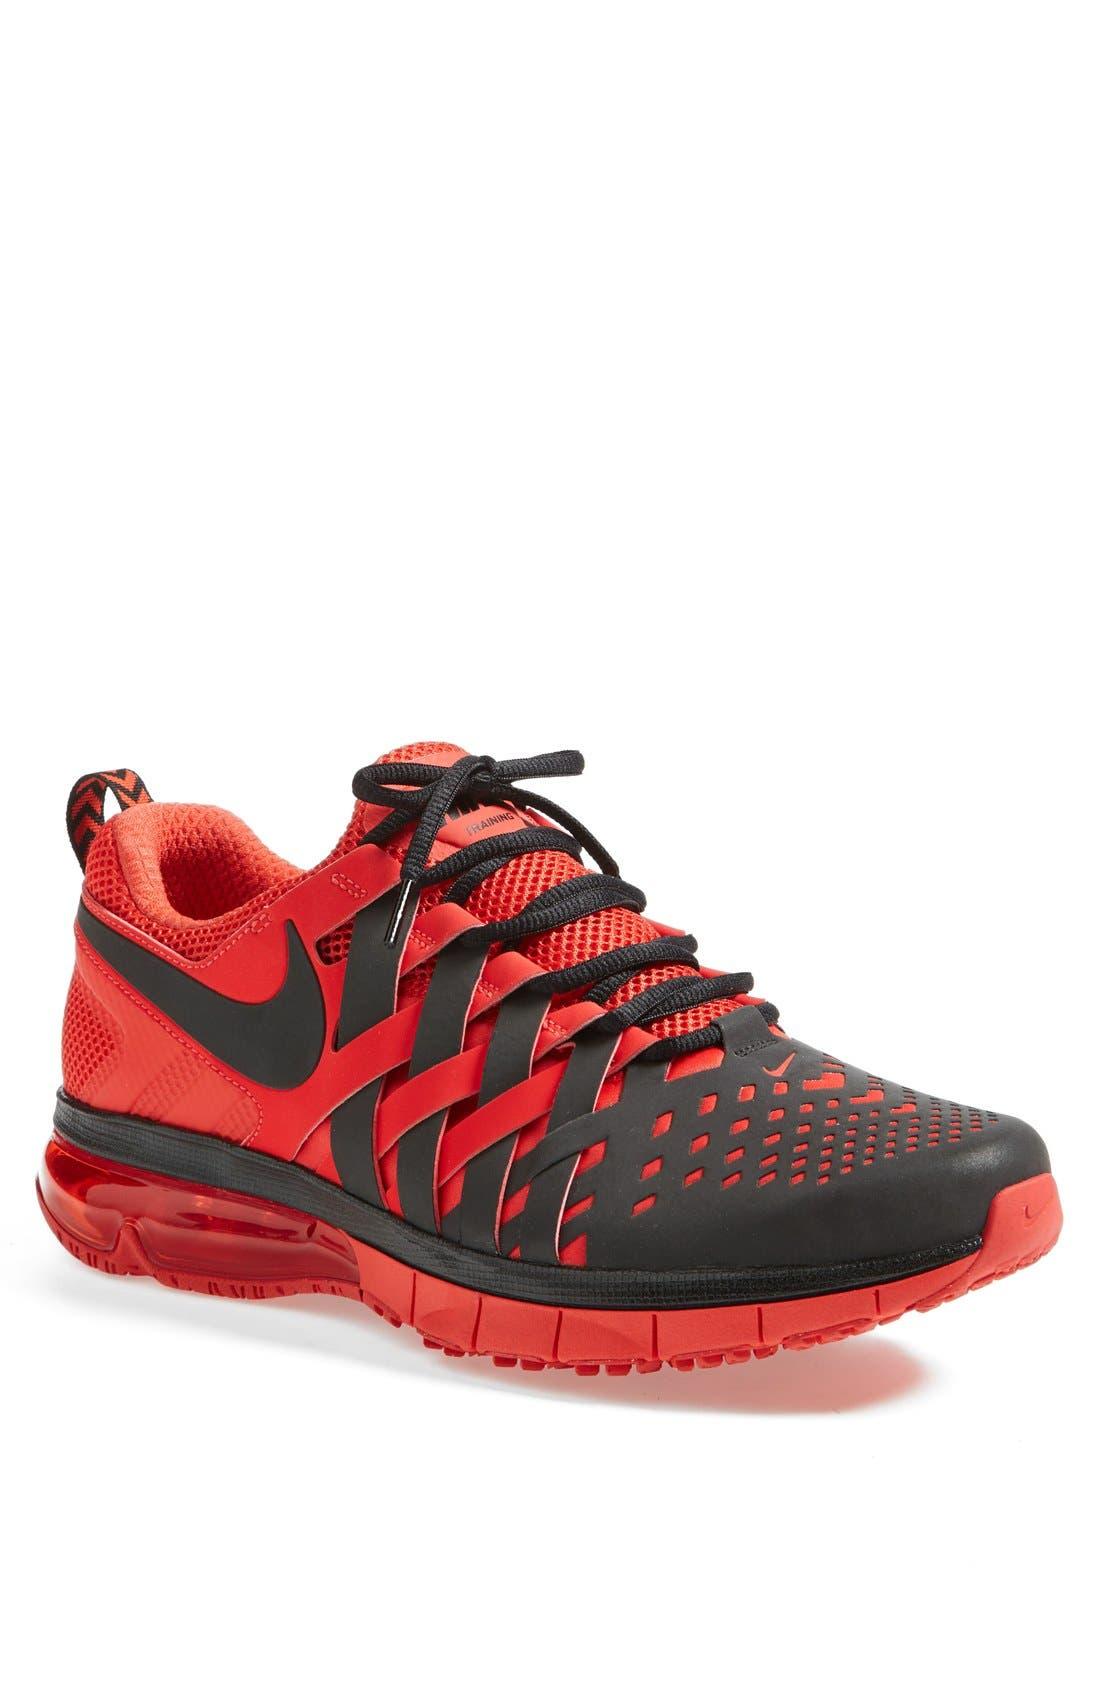 Nike 'Fingertrap Max' Training Shoe